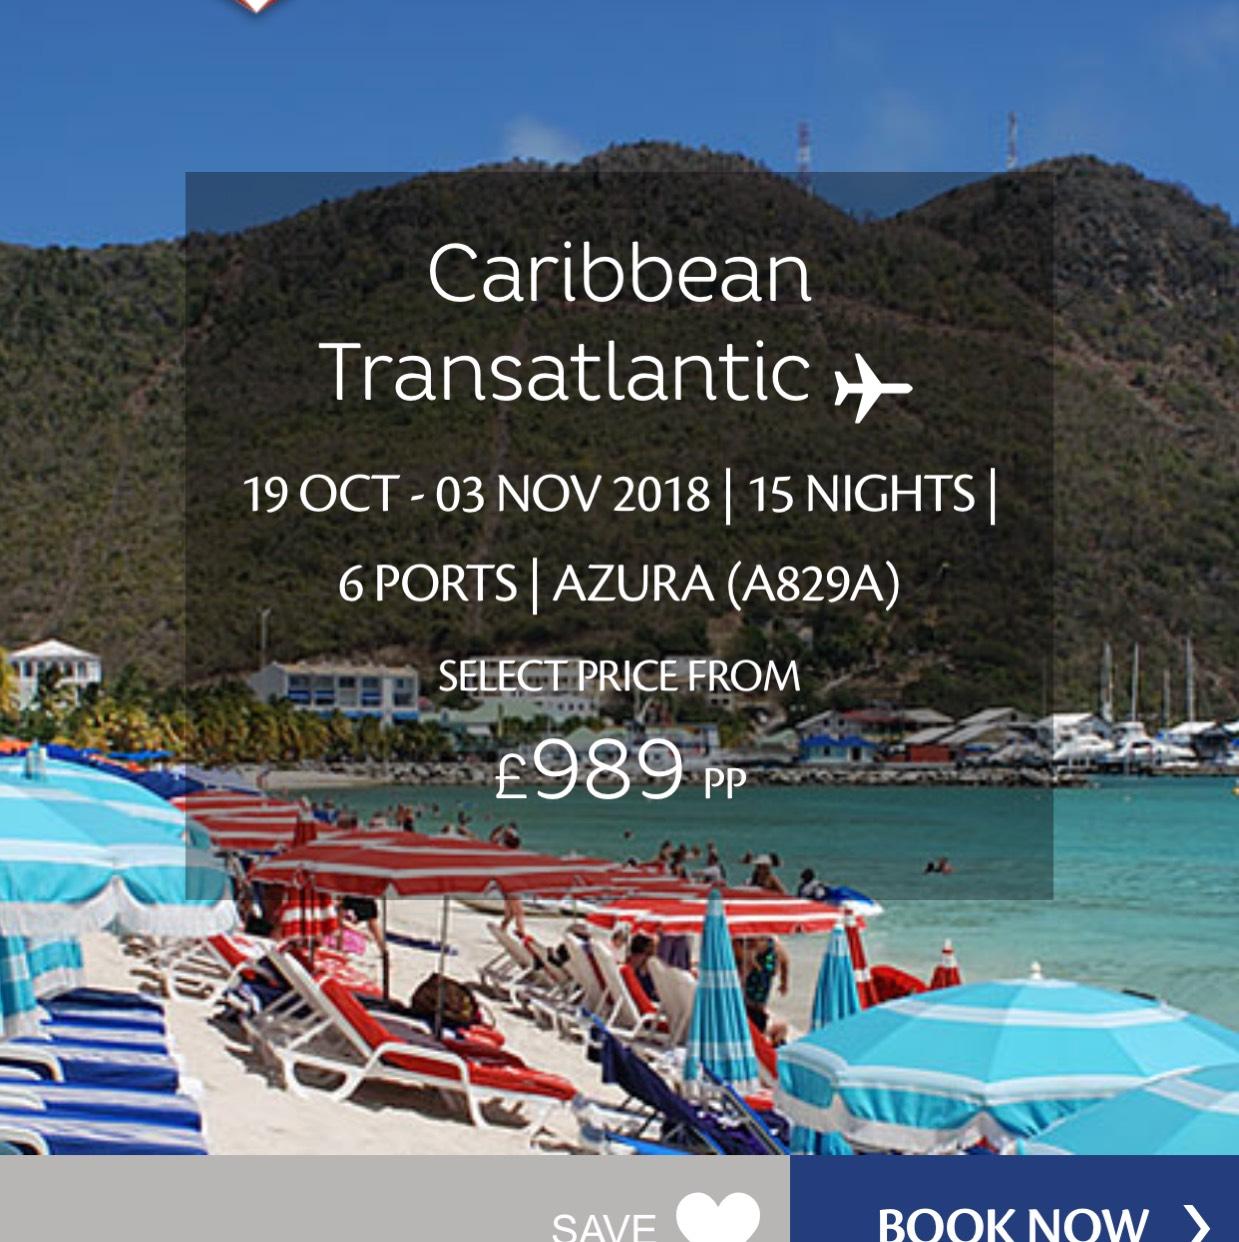 15 nights transatlantic P&O Caribbean cruise on Azura from £989pp @ P&O Cruises